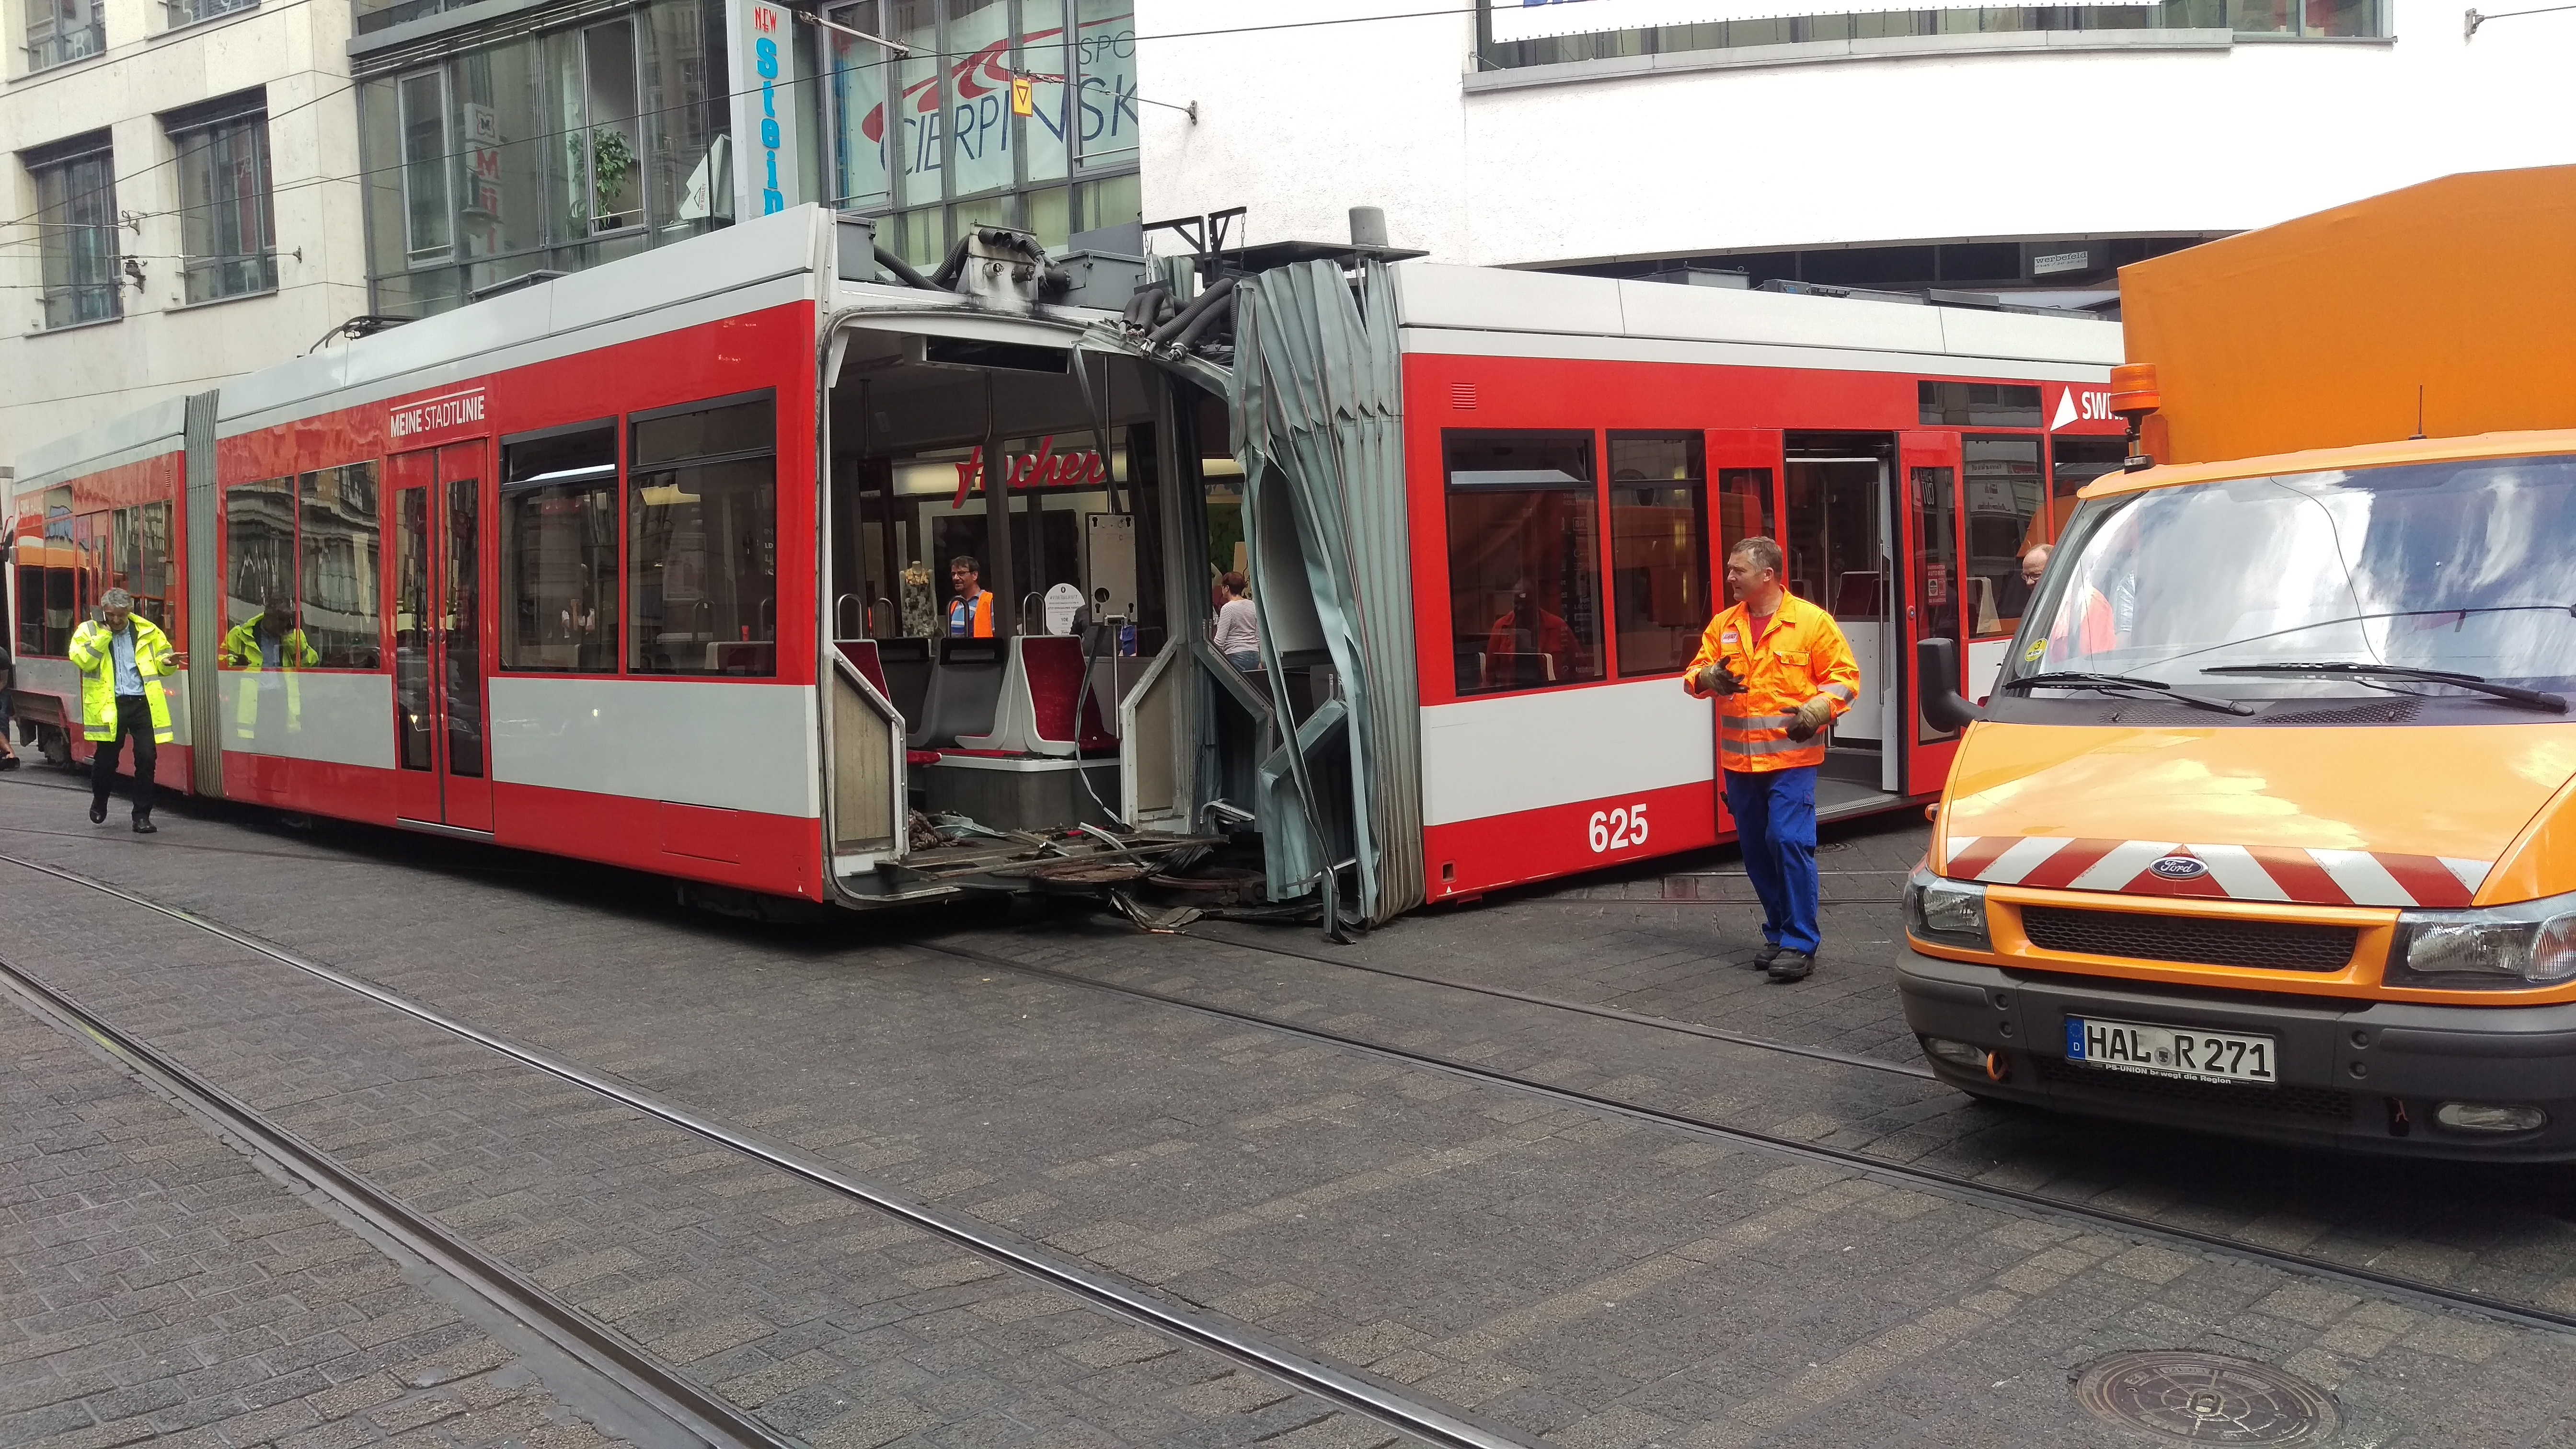 Straßenbahn in Halle entgleißt | radio SAW